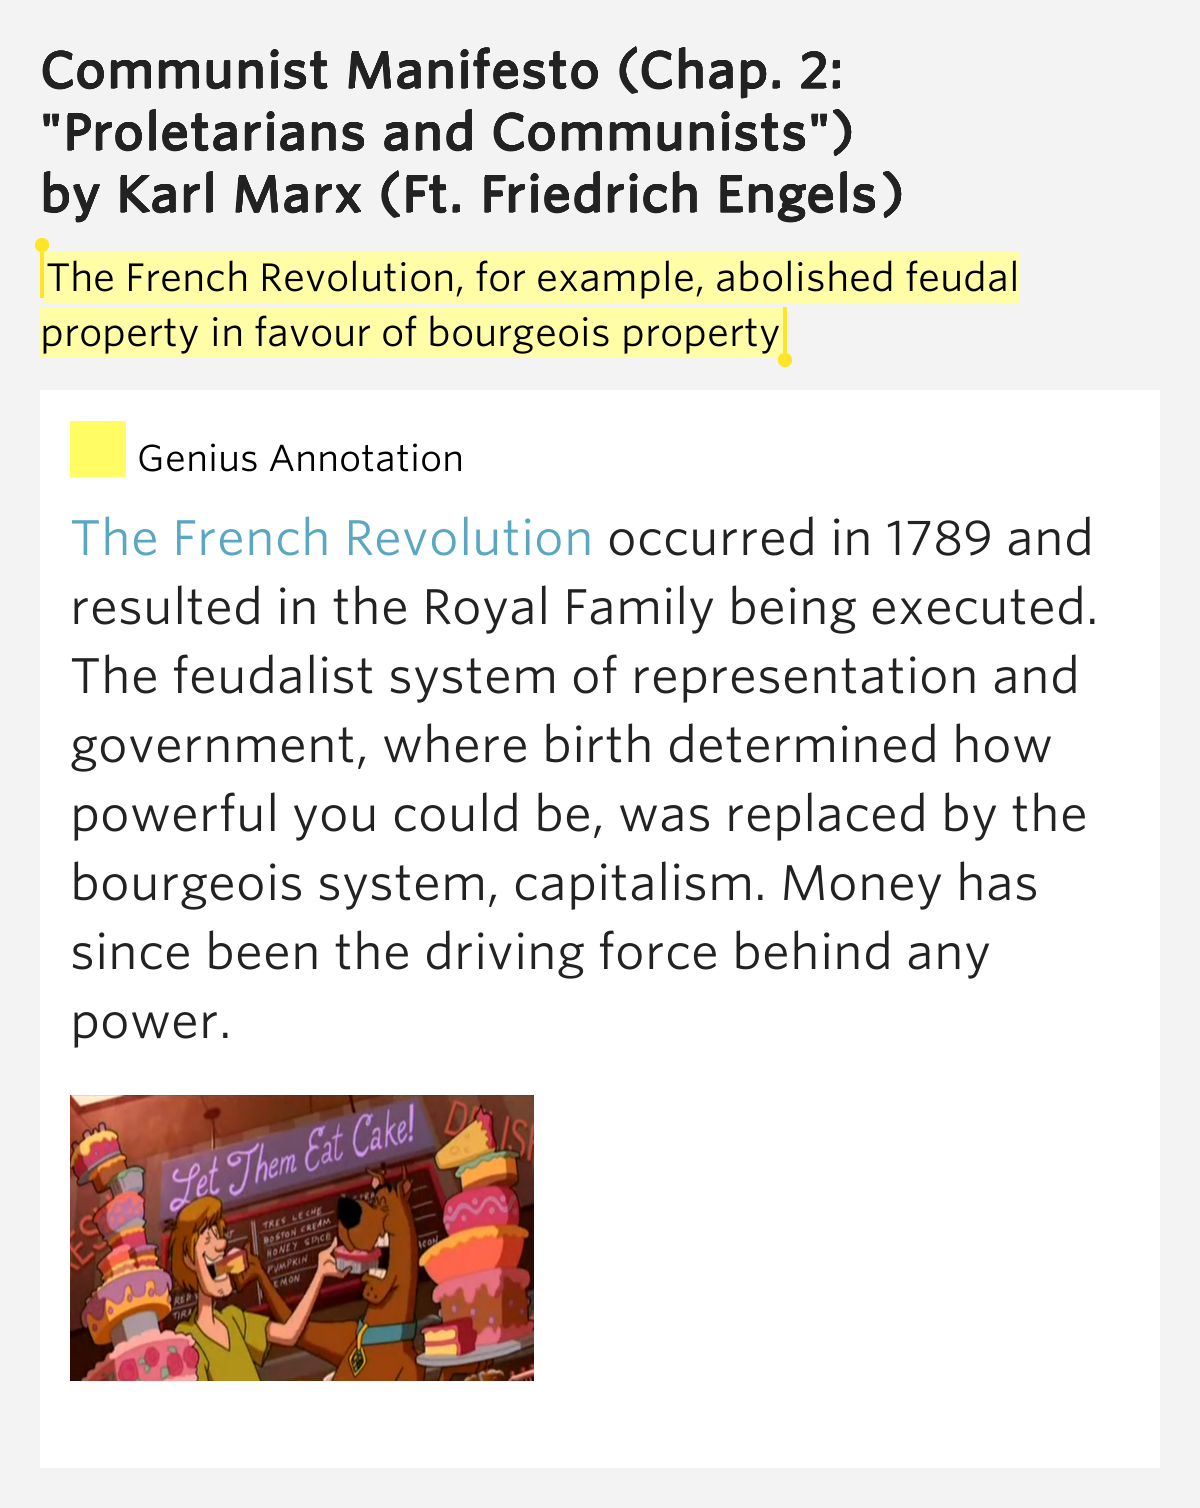 communist manifesto bourgeois and proletarians essay